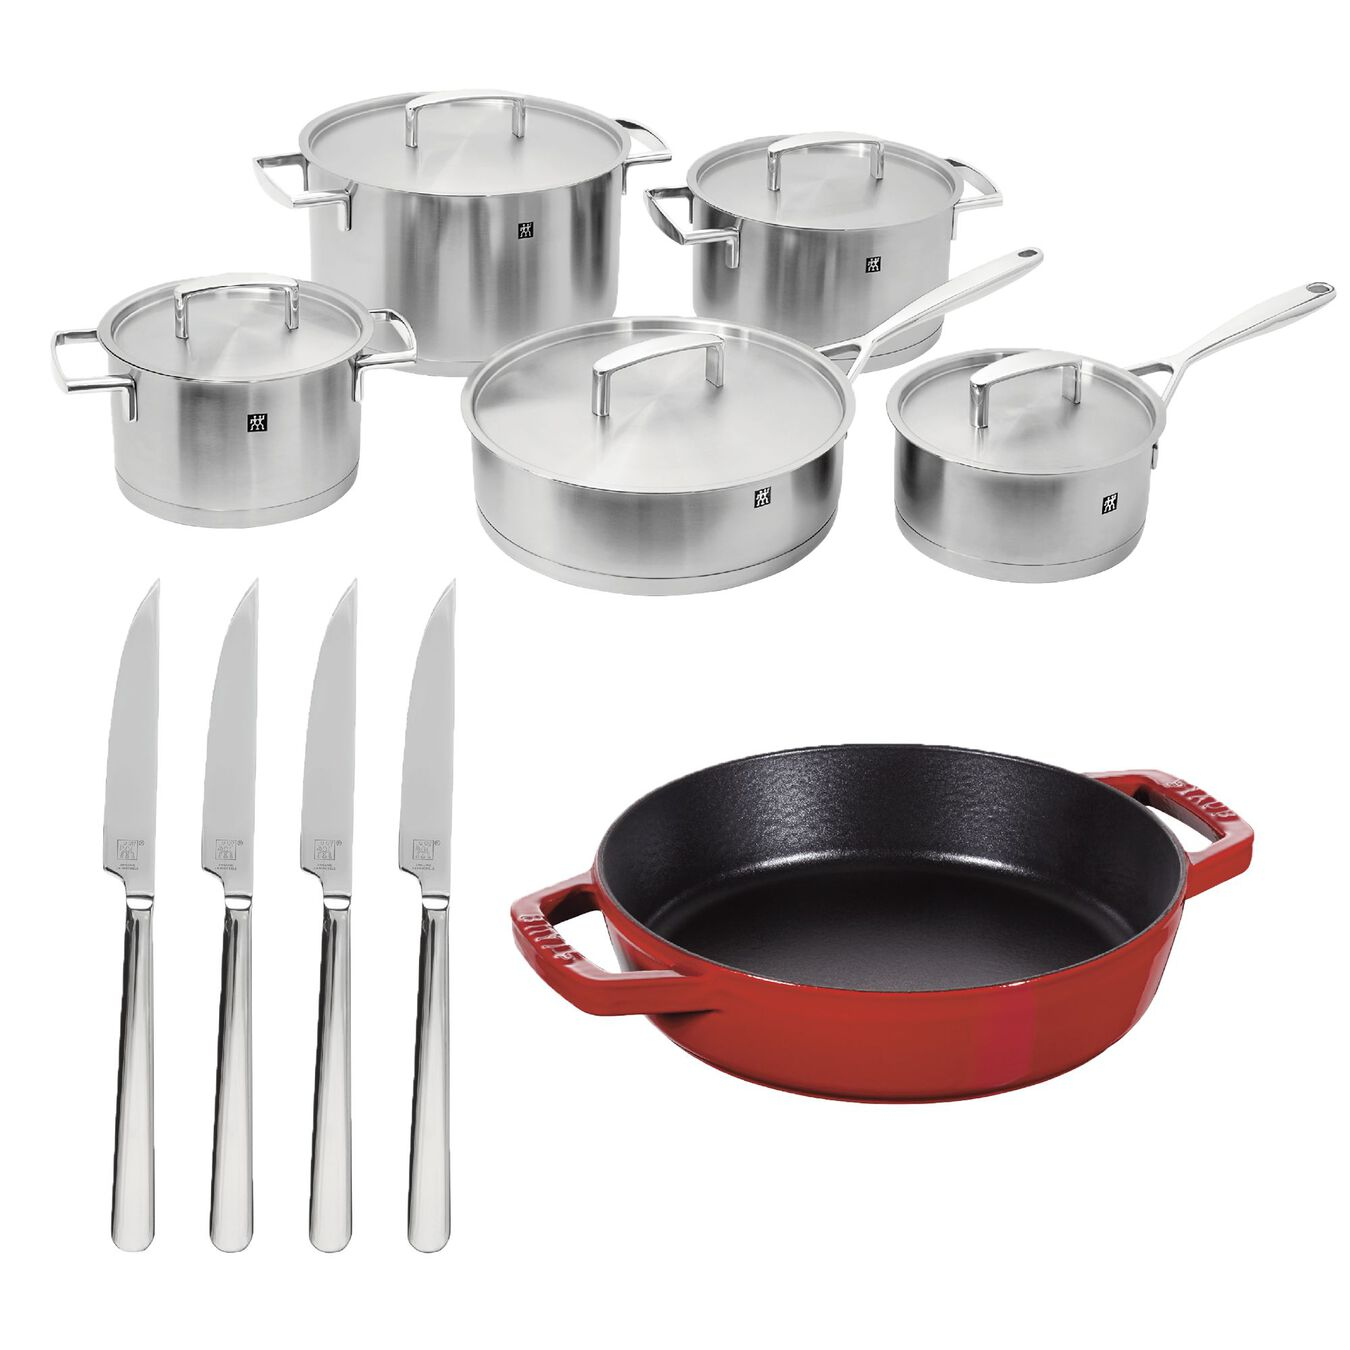 10 piece cookware set with bonus cast iron frypan and 4 piece steak knives,,large 1